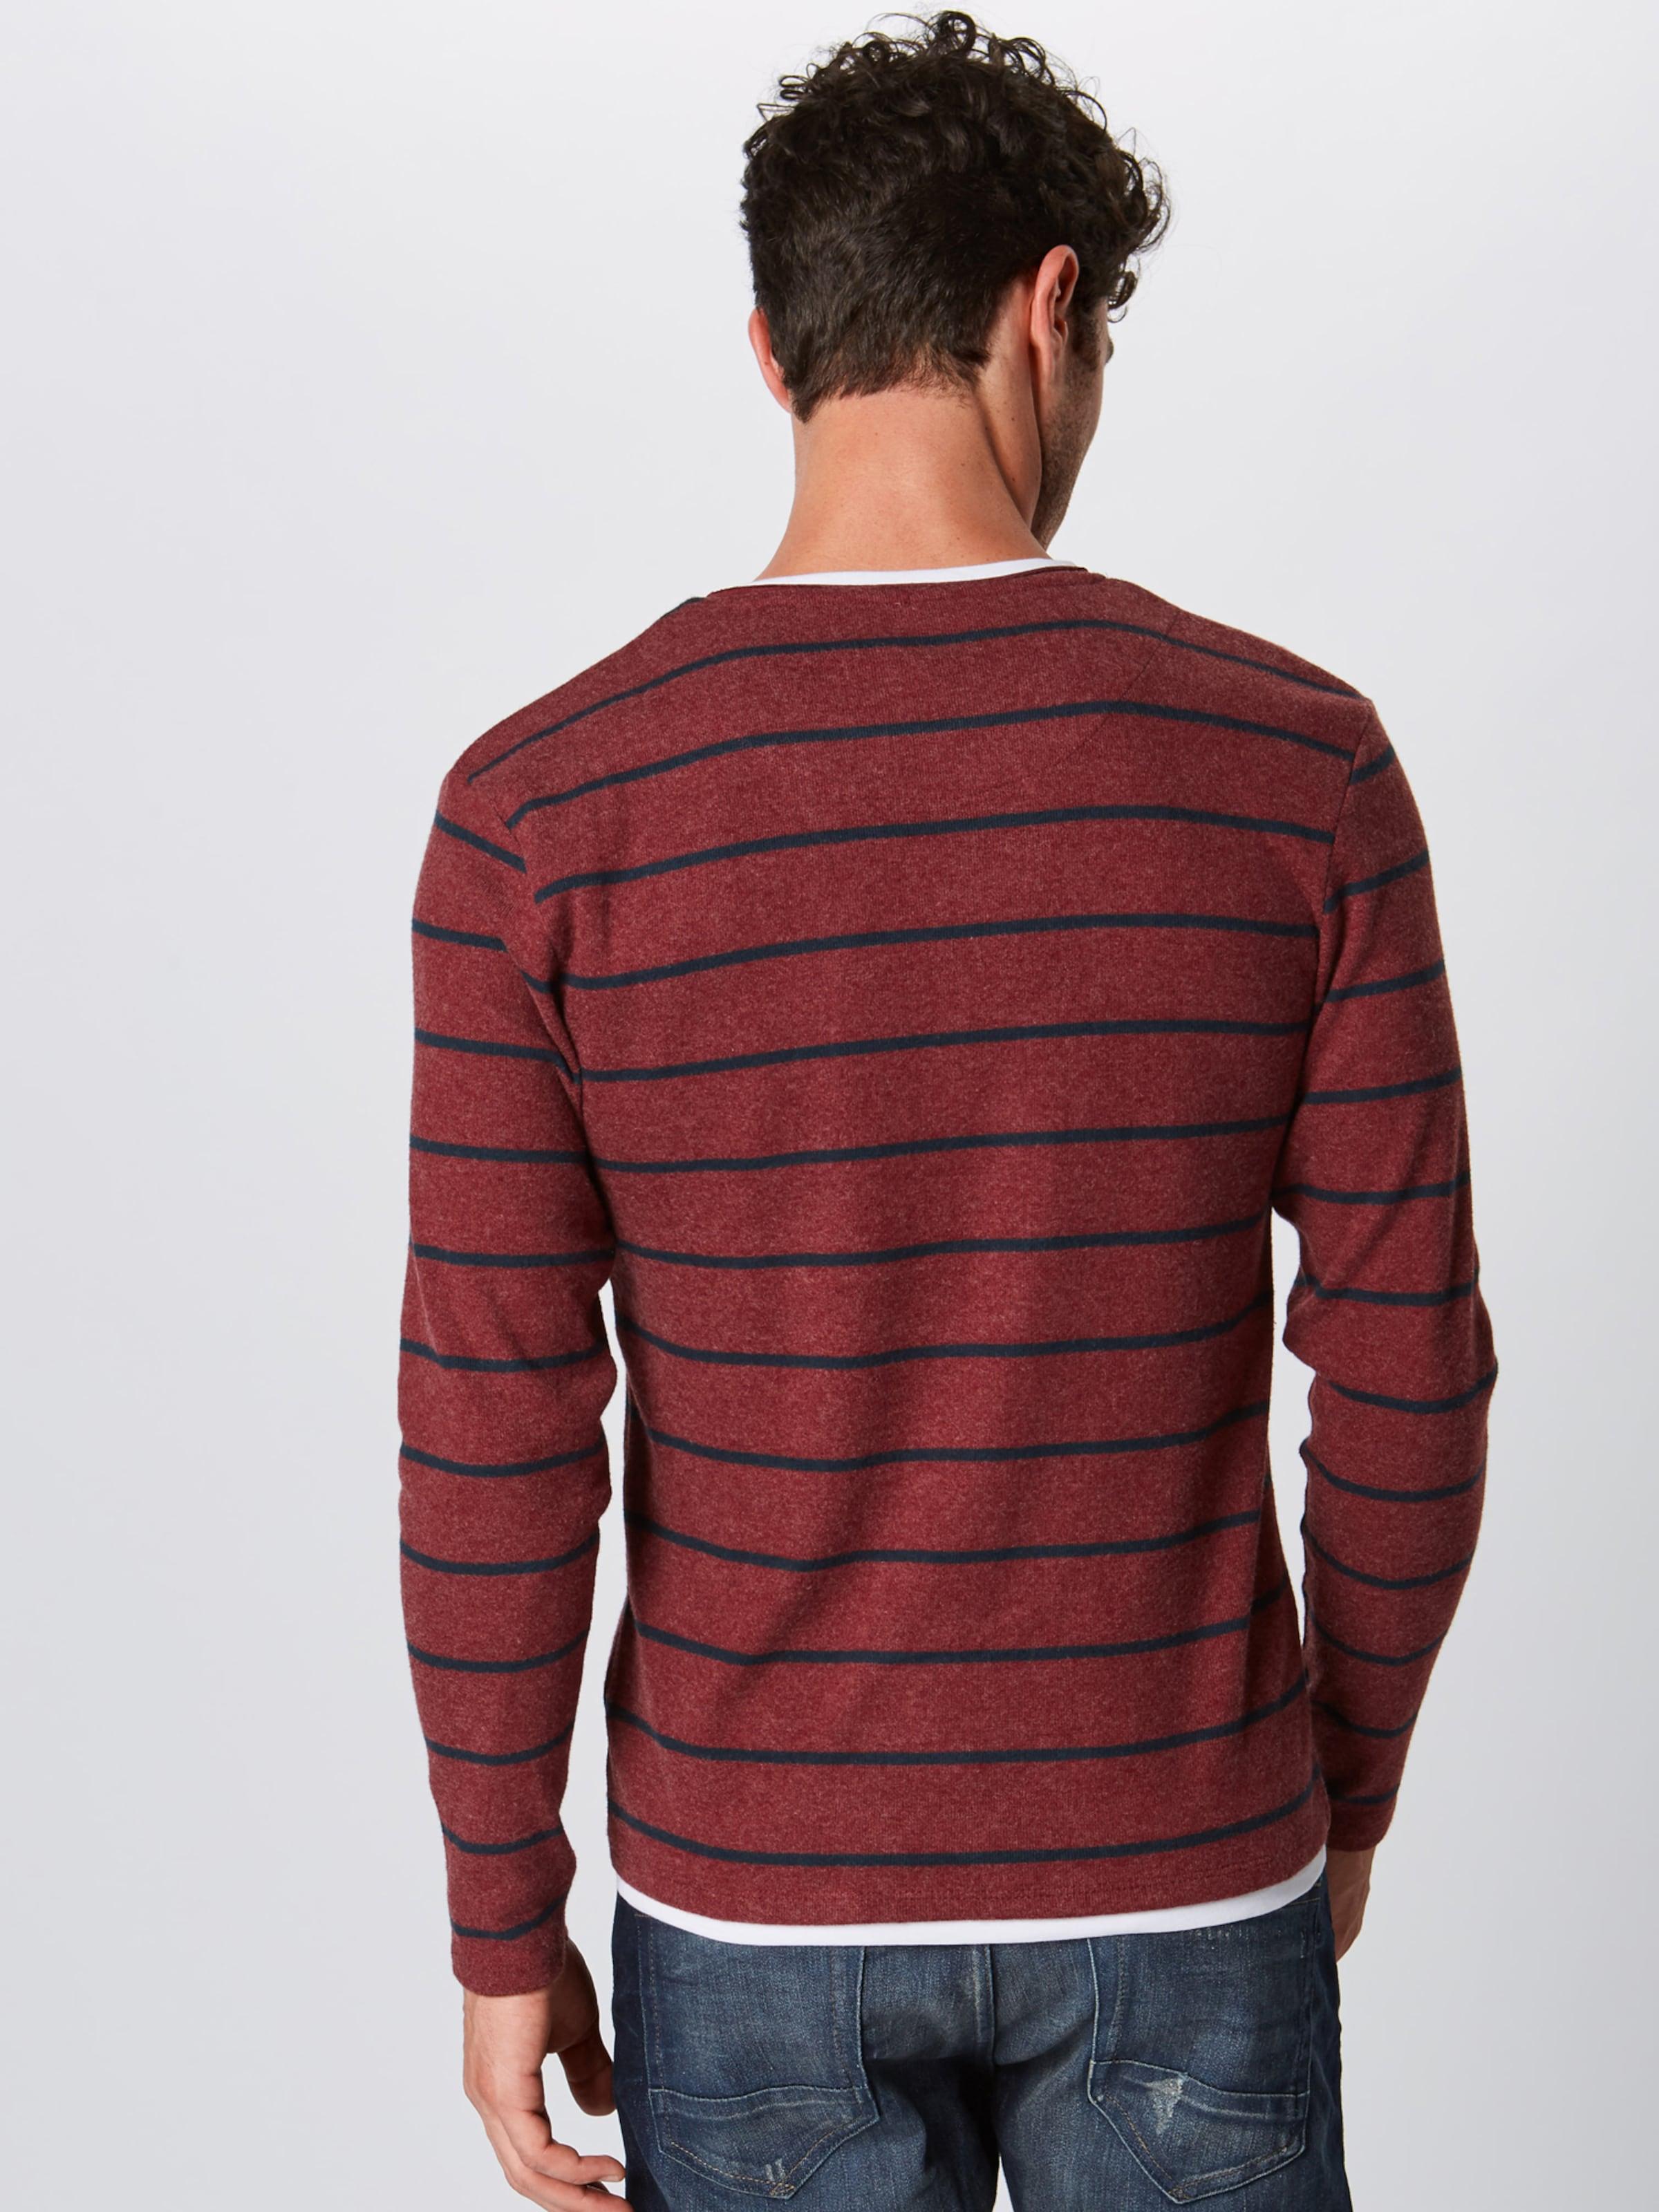 Sweat shirt Largo Orlando Round' Key 'msw En Bordeaux VqUzMpGLS